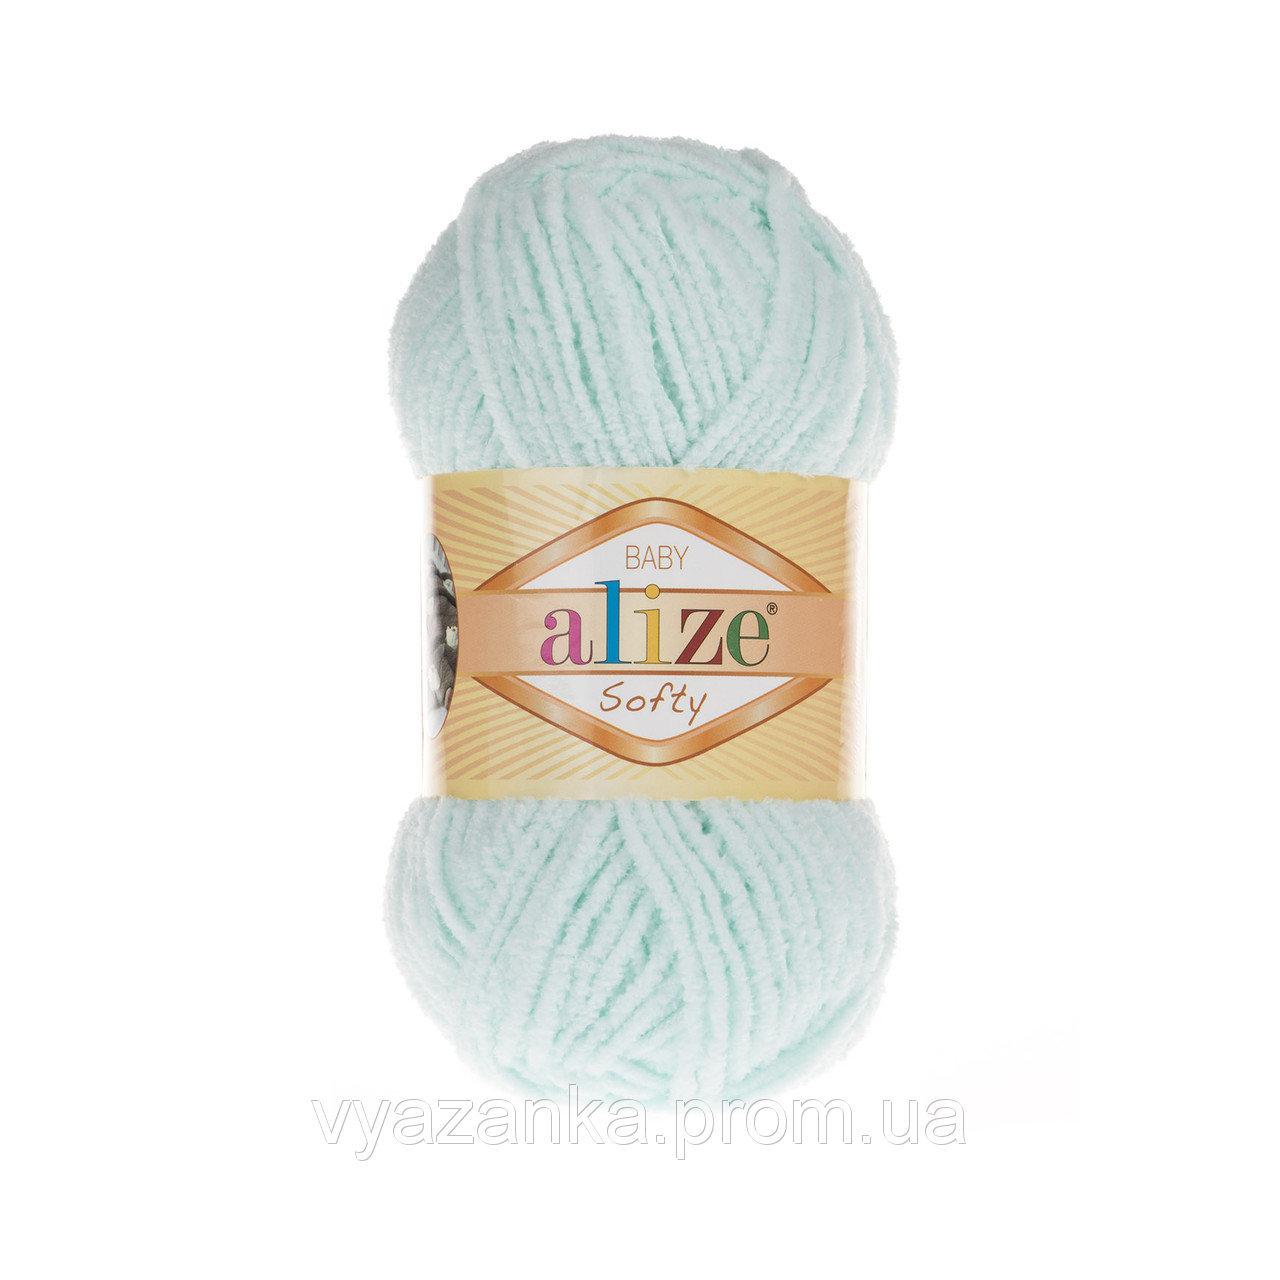 Пряжа Alize Softy светлая мята 15